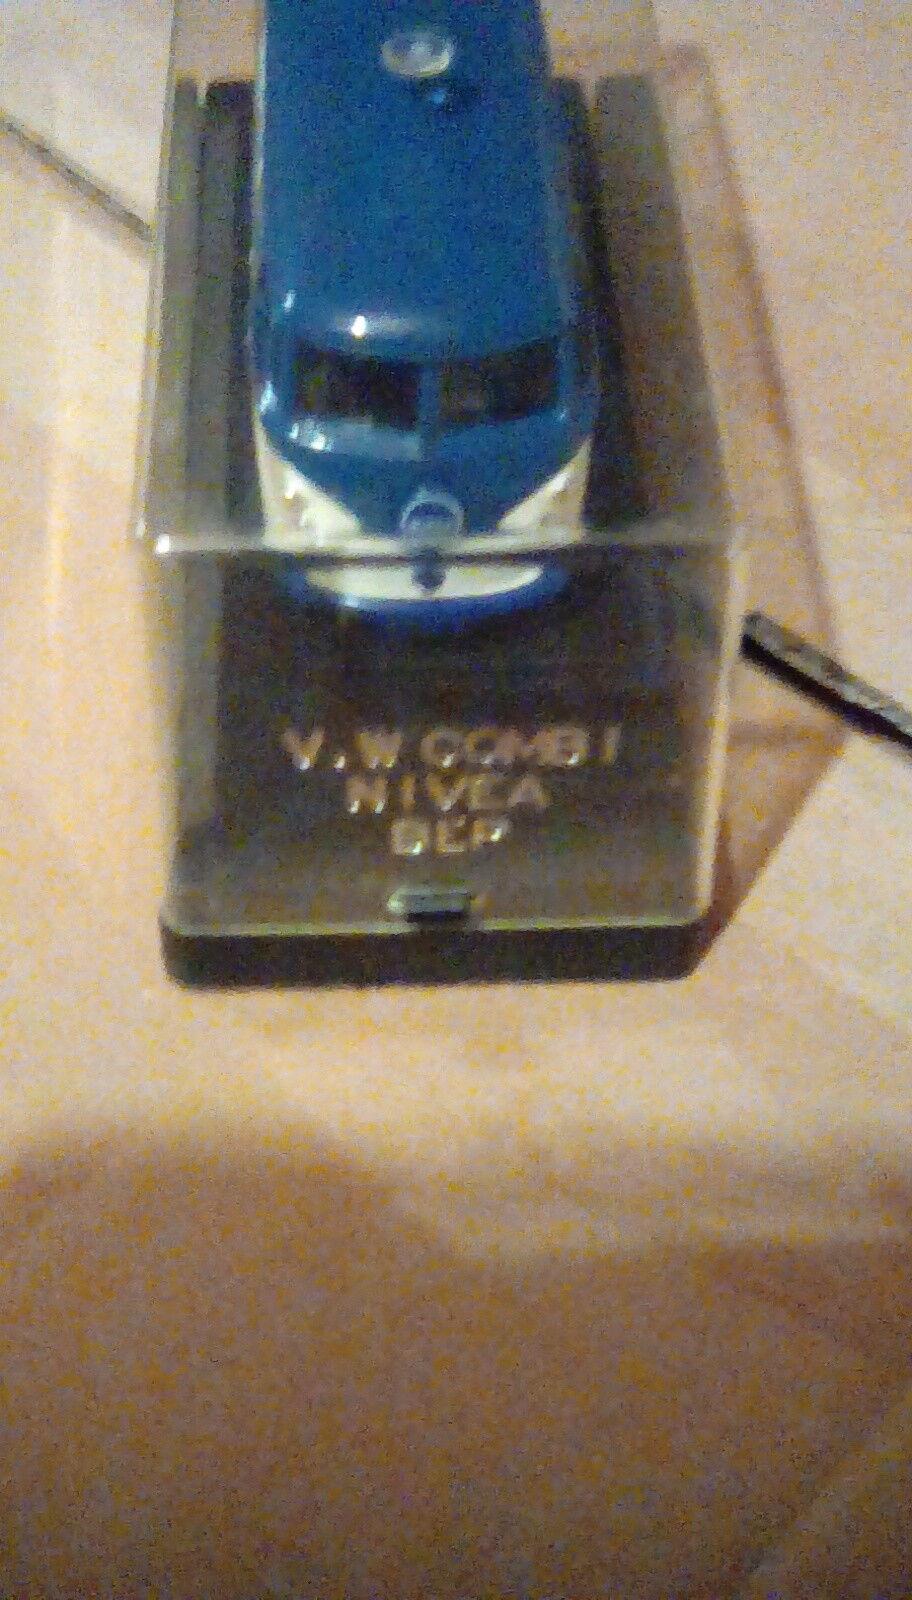 RARE SOLIDO VEREM VEREM VEREM VW T1 VAN NIVEA 1 43 SCALE LTD EDITION FIRST ISSUE MINT IN BOX 1ab89a